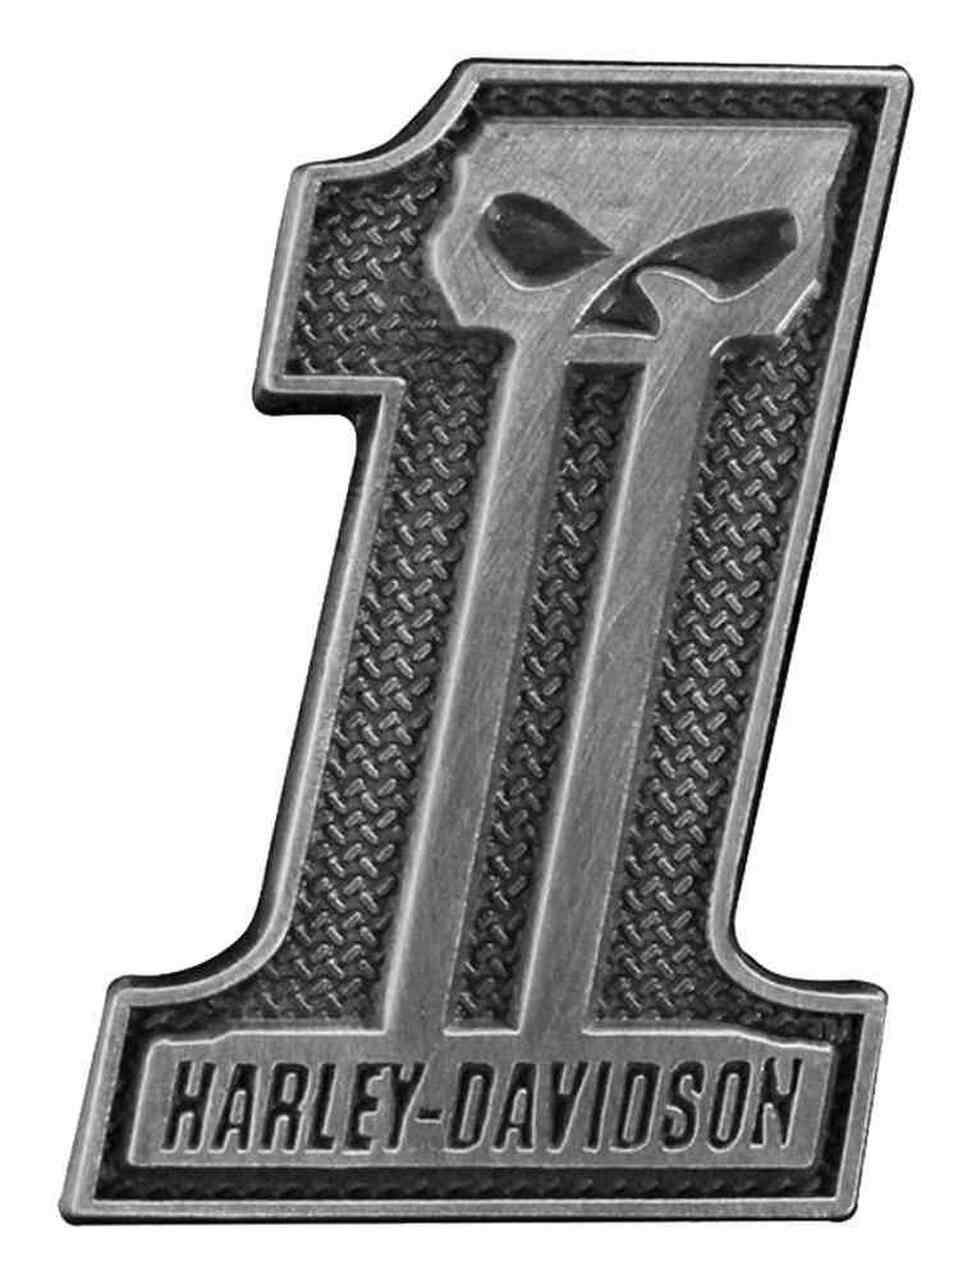 HARLEY DAVIDSON PIN, 31 SKULL, ANTIQUED SILVER FINISH, FLAT HEAD PIN BACKS